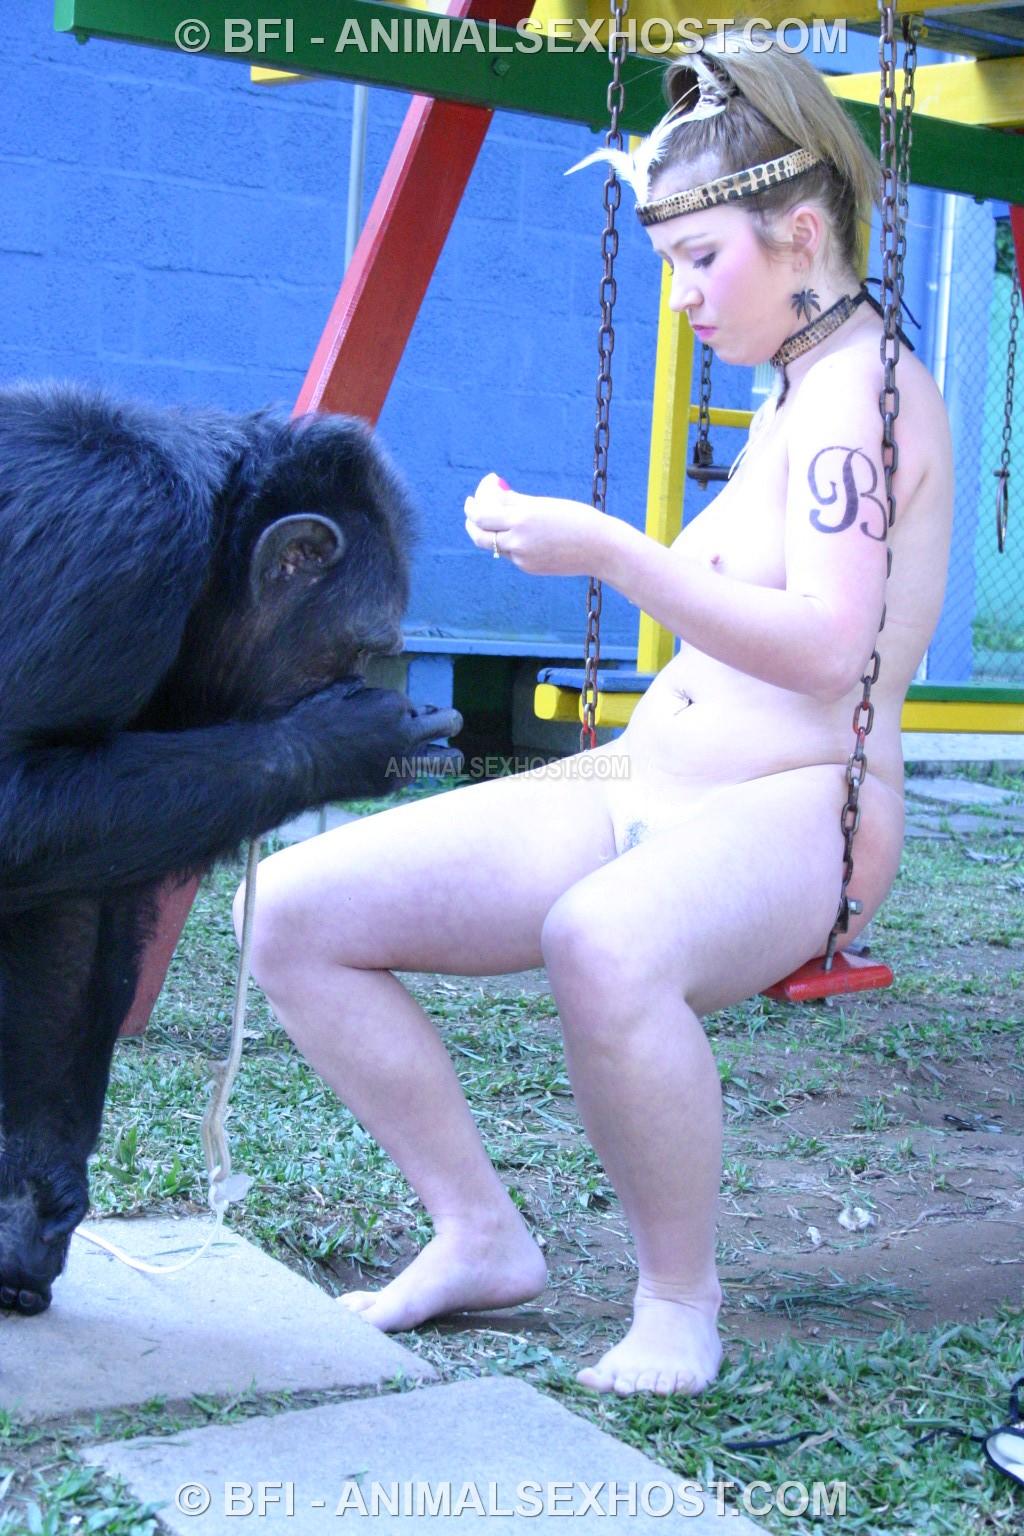 For Chimpanzee sex videos